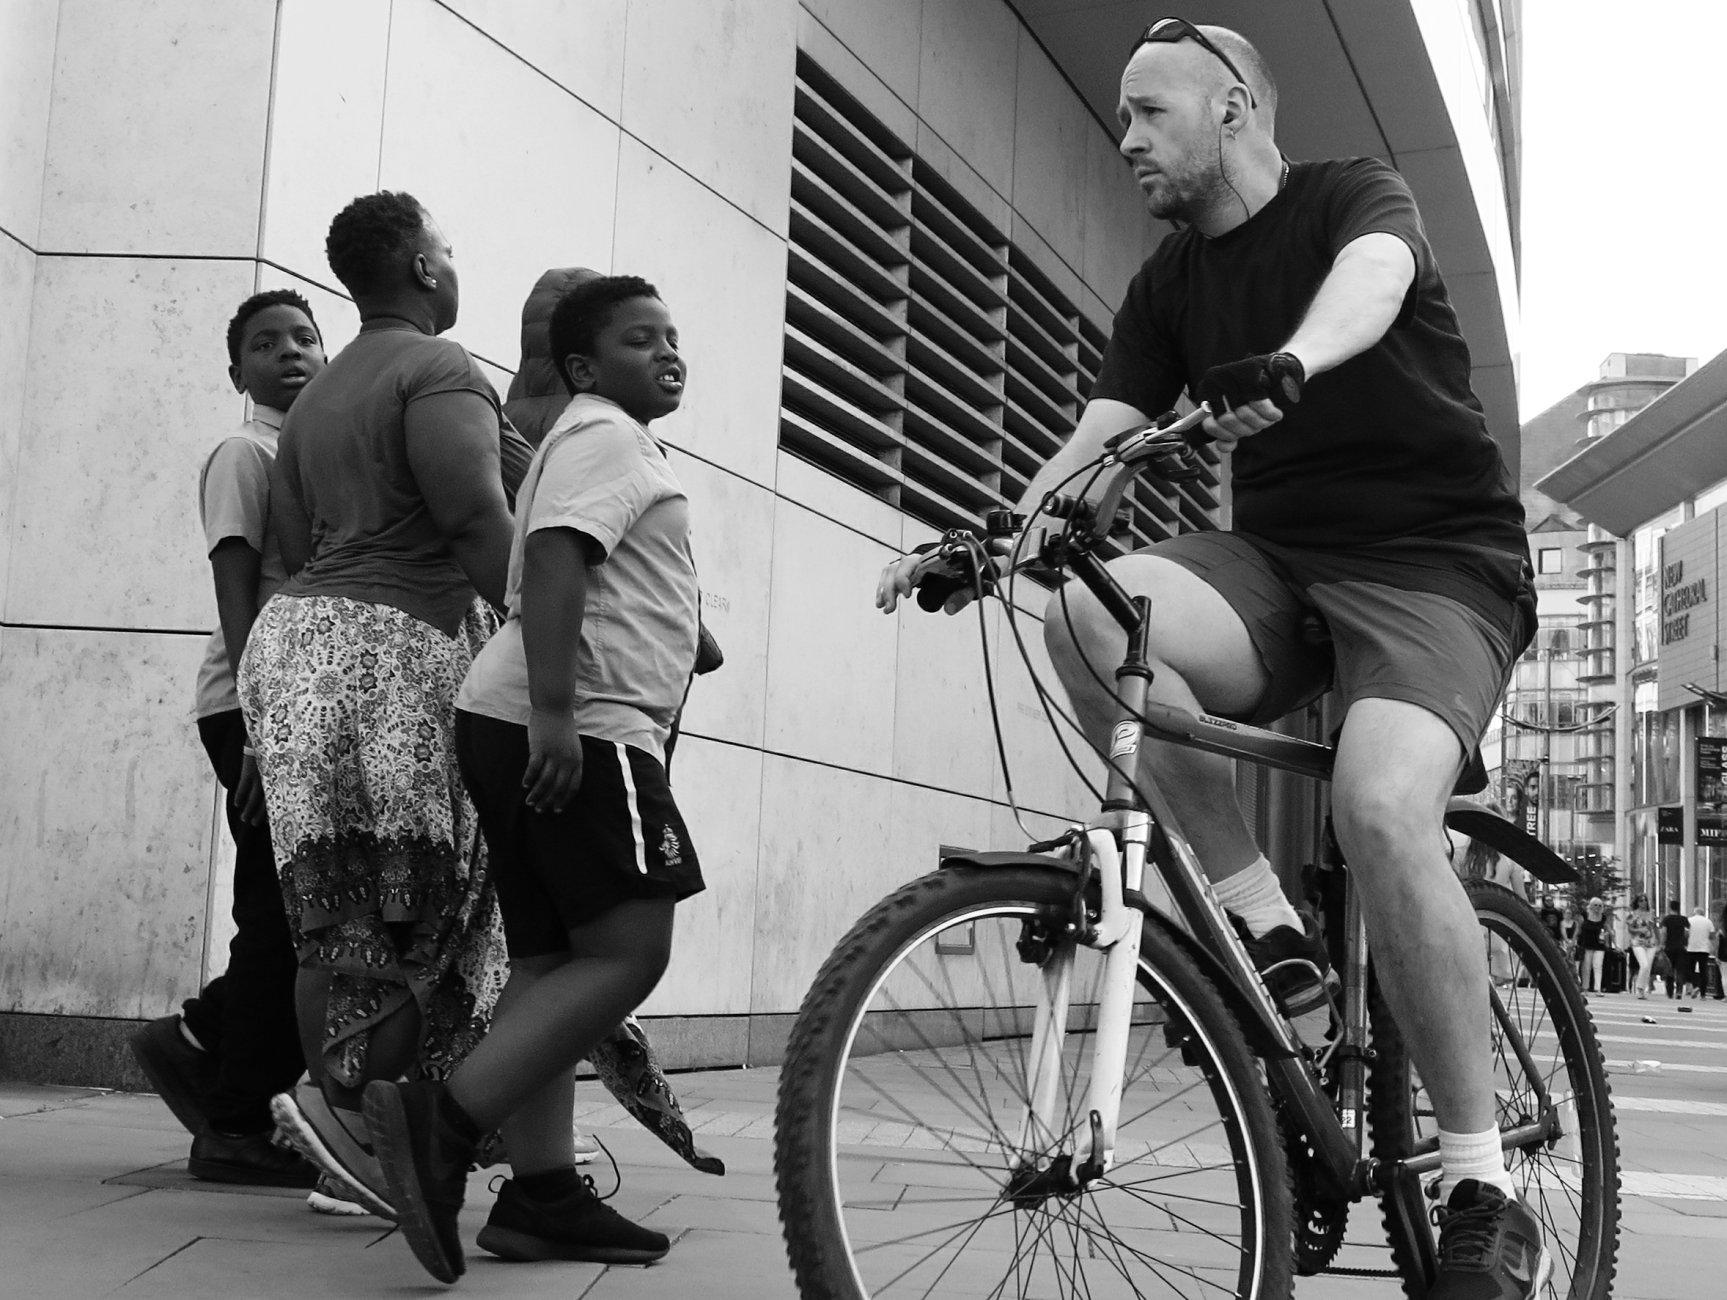 Street cyclist